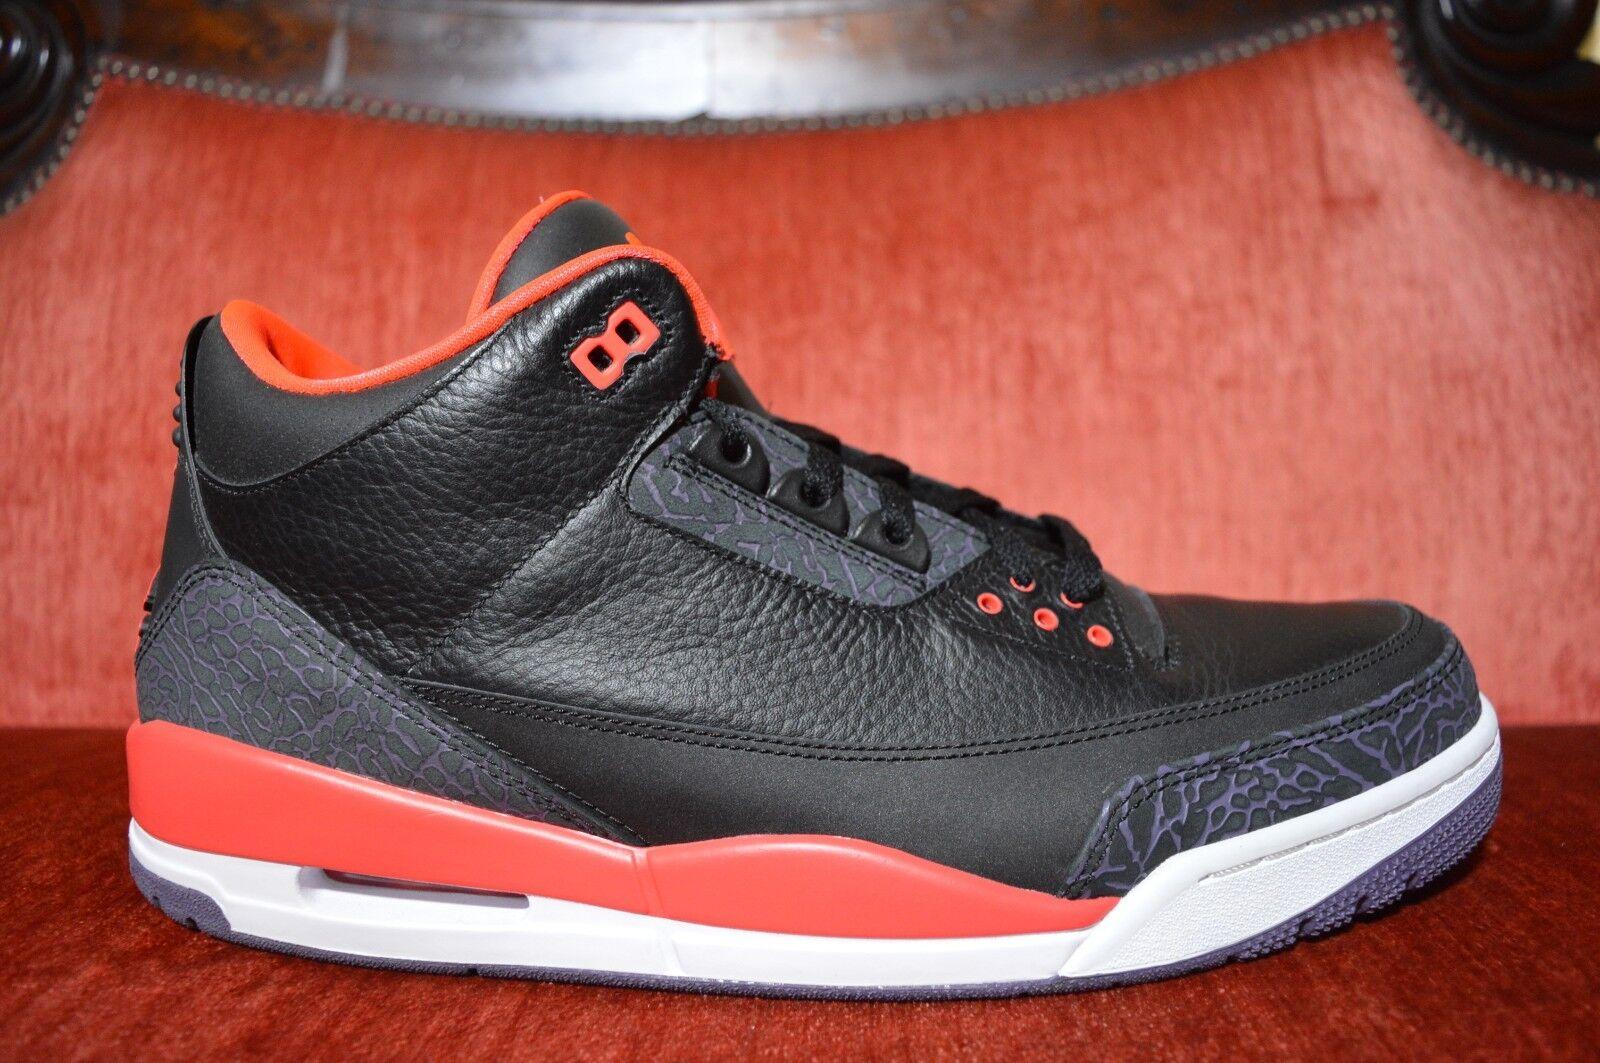 VNDS Nike AIR JORDAN 3 RETRO BRIGHT CRIMSON BLACK 3M REFLECTIVE III 136064 005